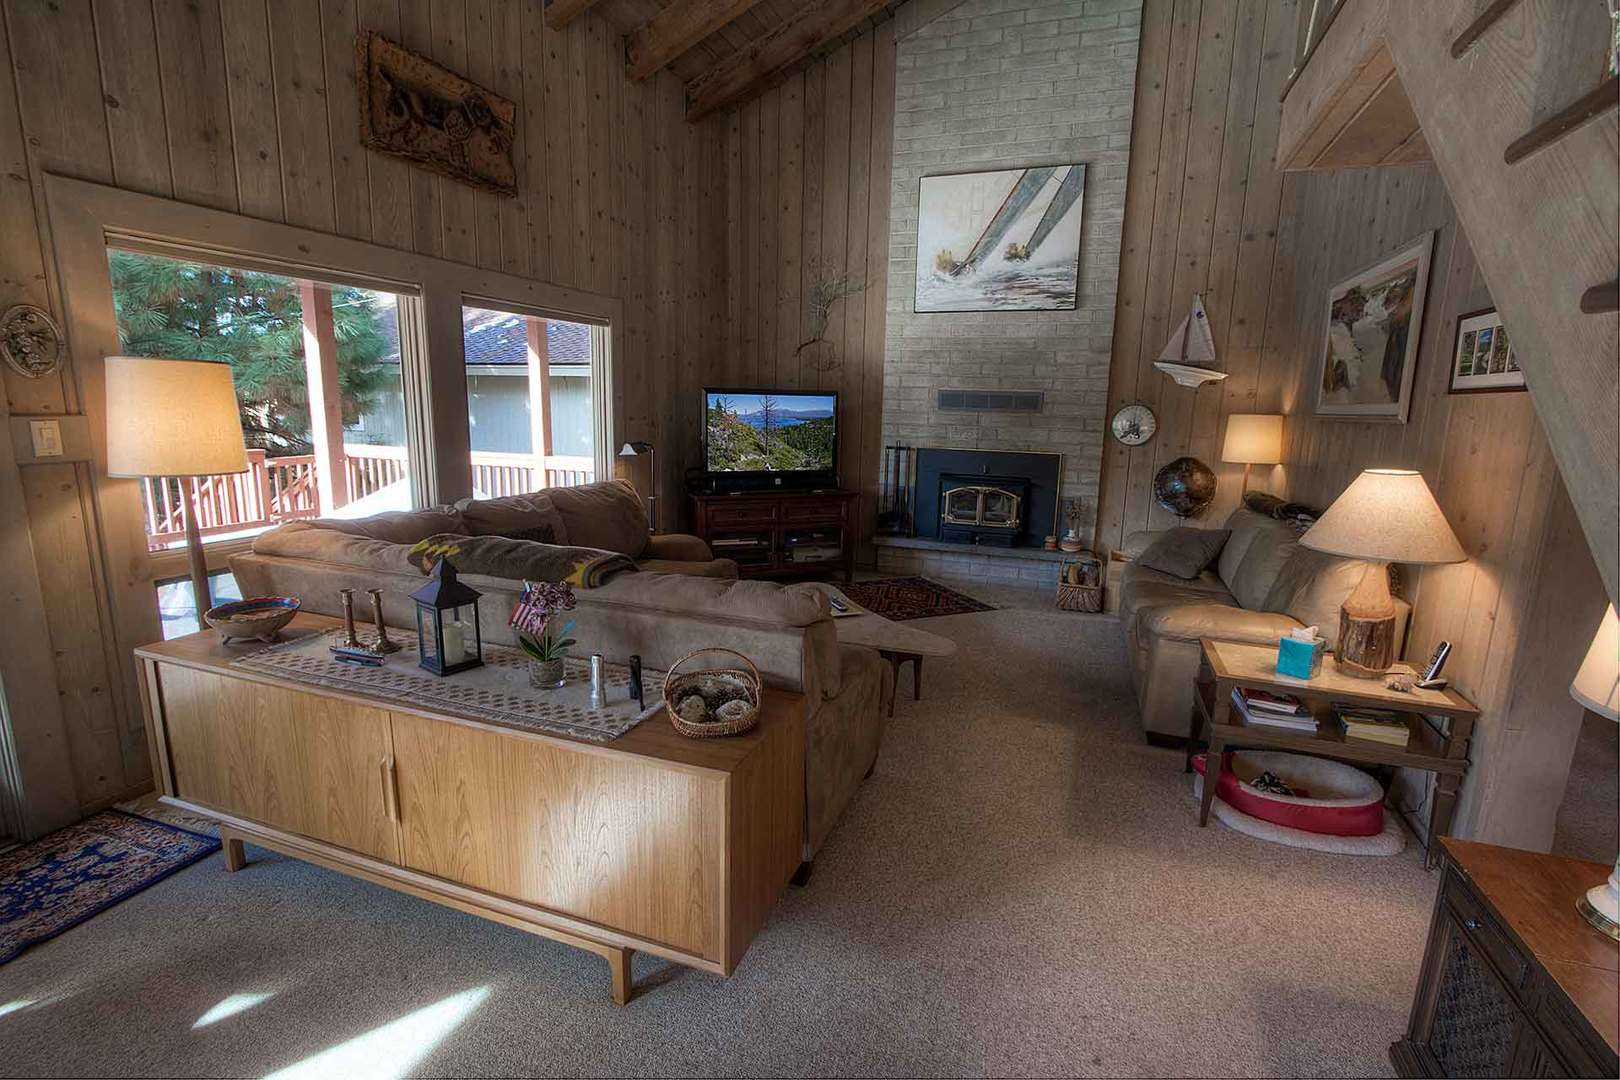 nvh0623 living room